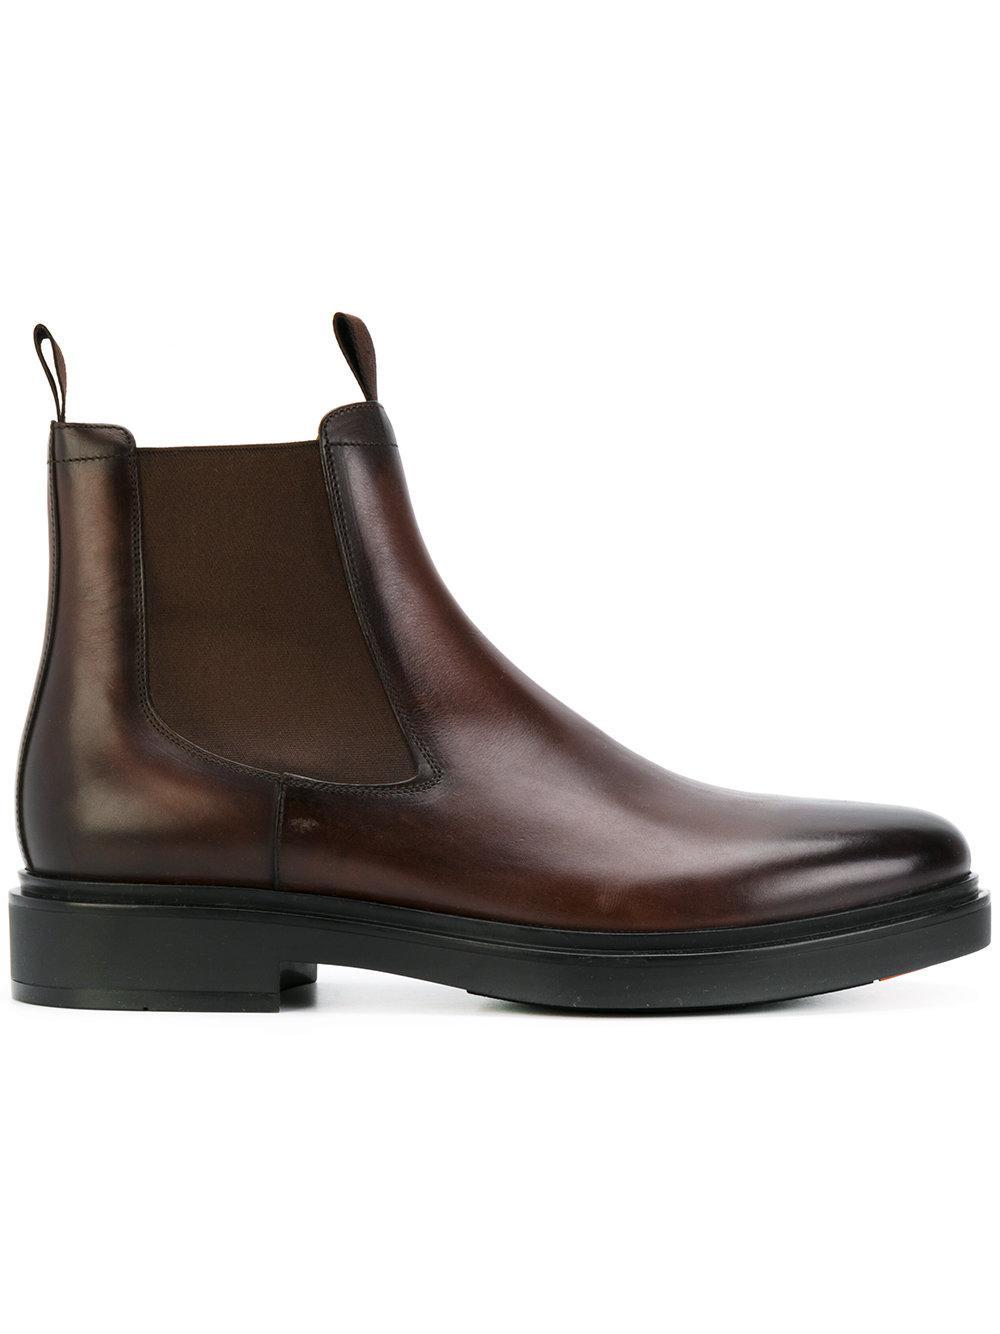 62b76fde0c3c8 Santoni Beatles Ankle Boots in Brown - Lyst